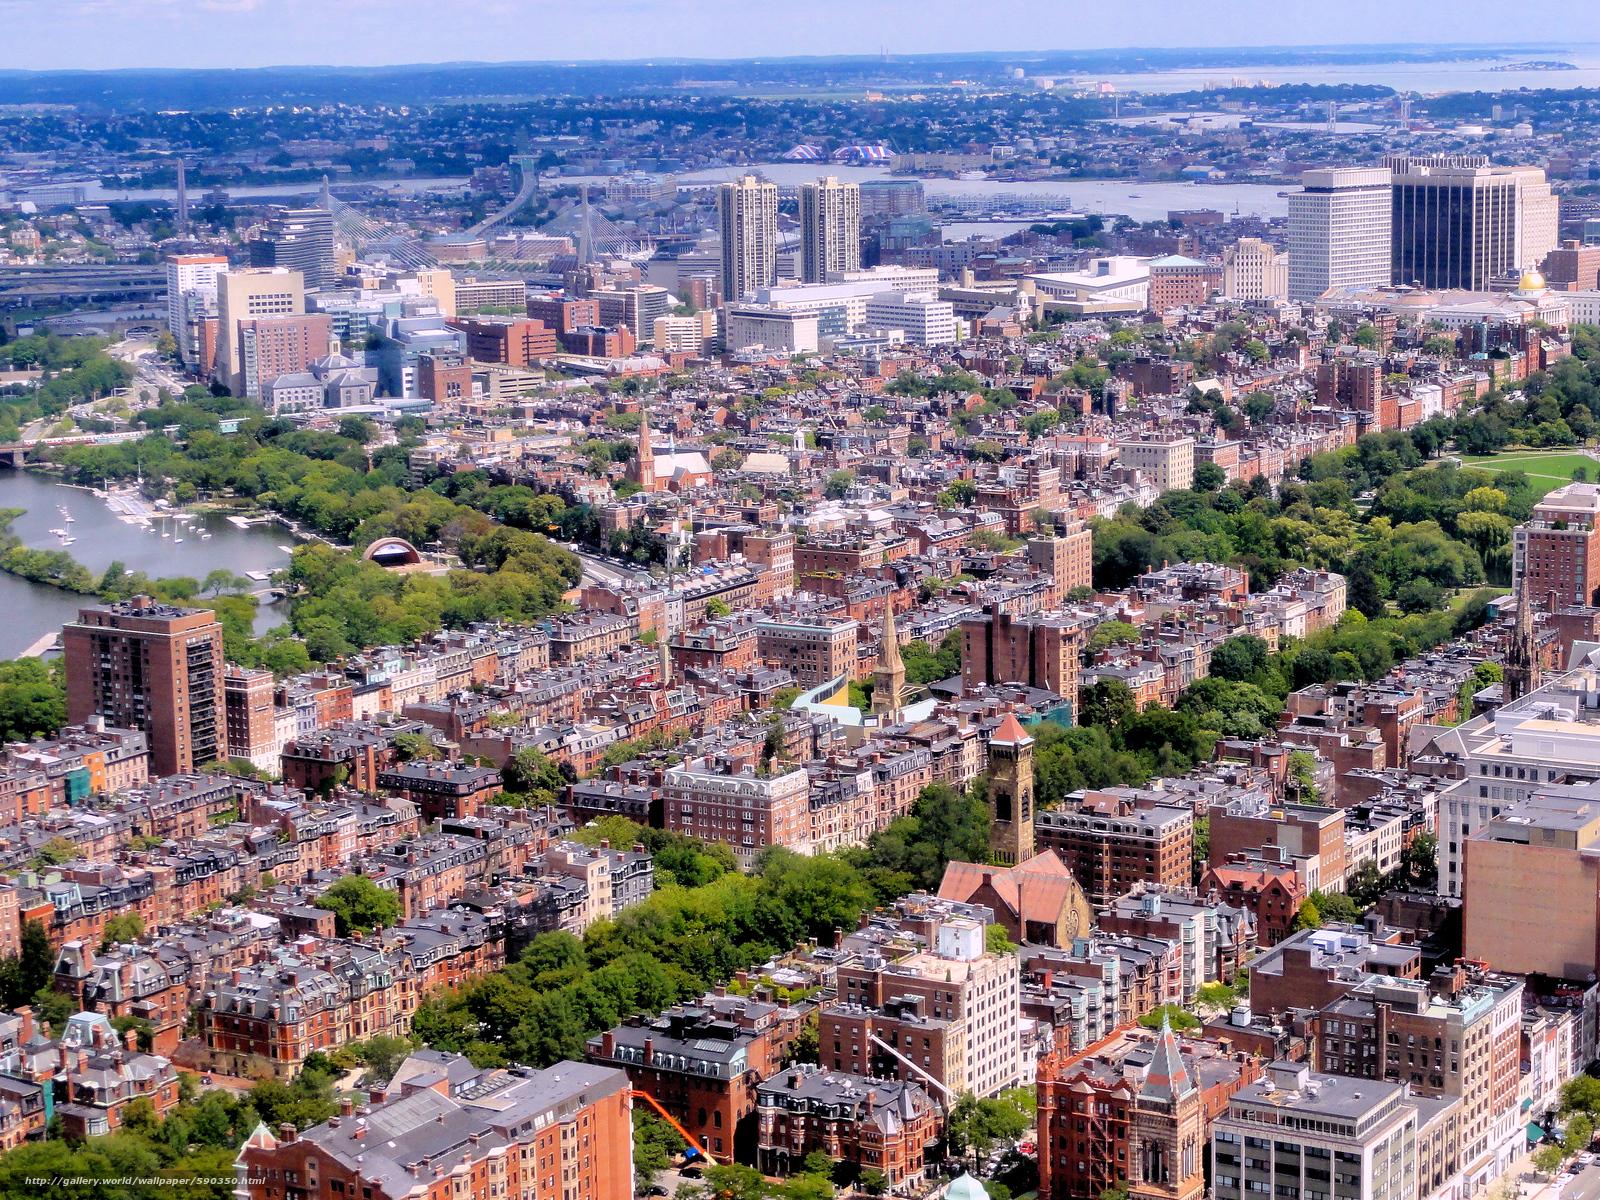 Download wallpaper Beacon Hill, Boston